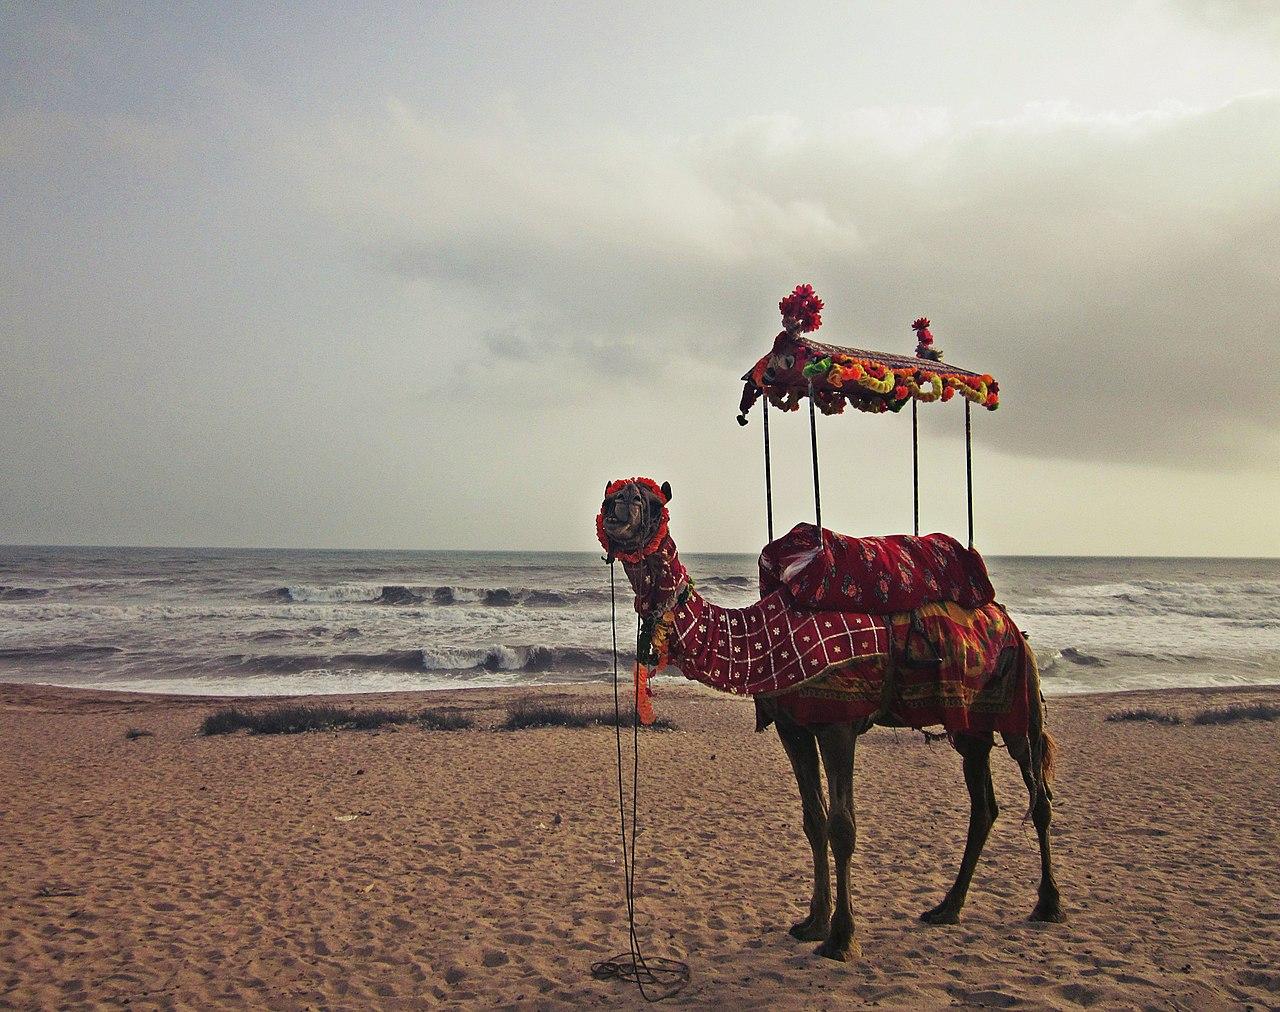 The Madhavpur Beach Experience, Gujarat